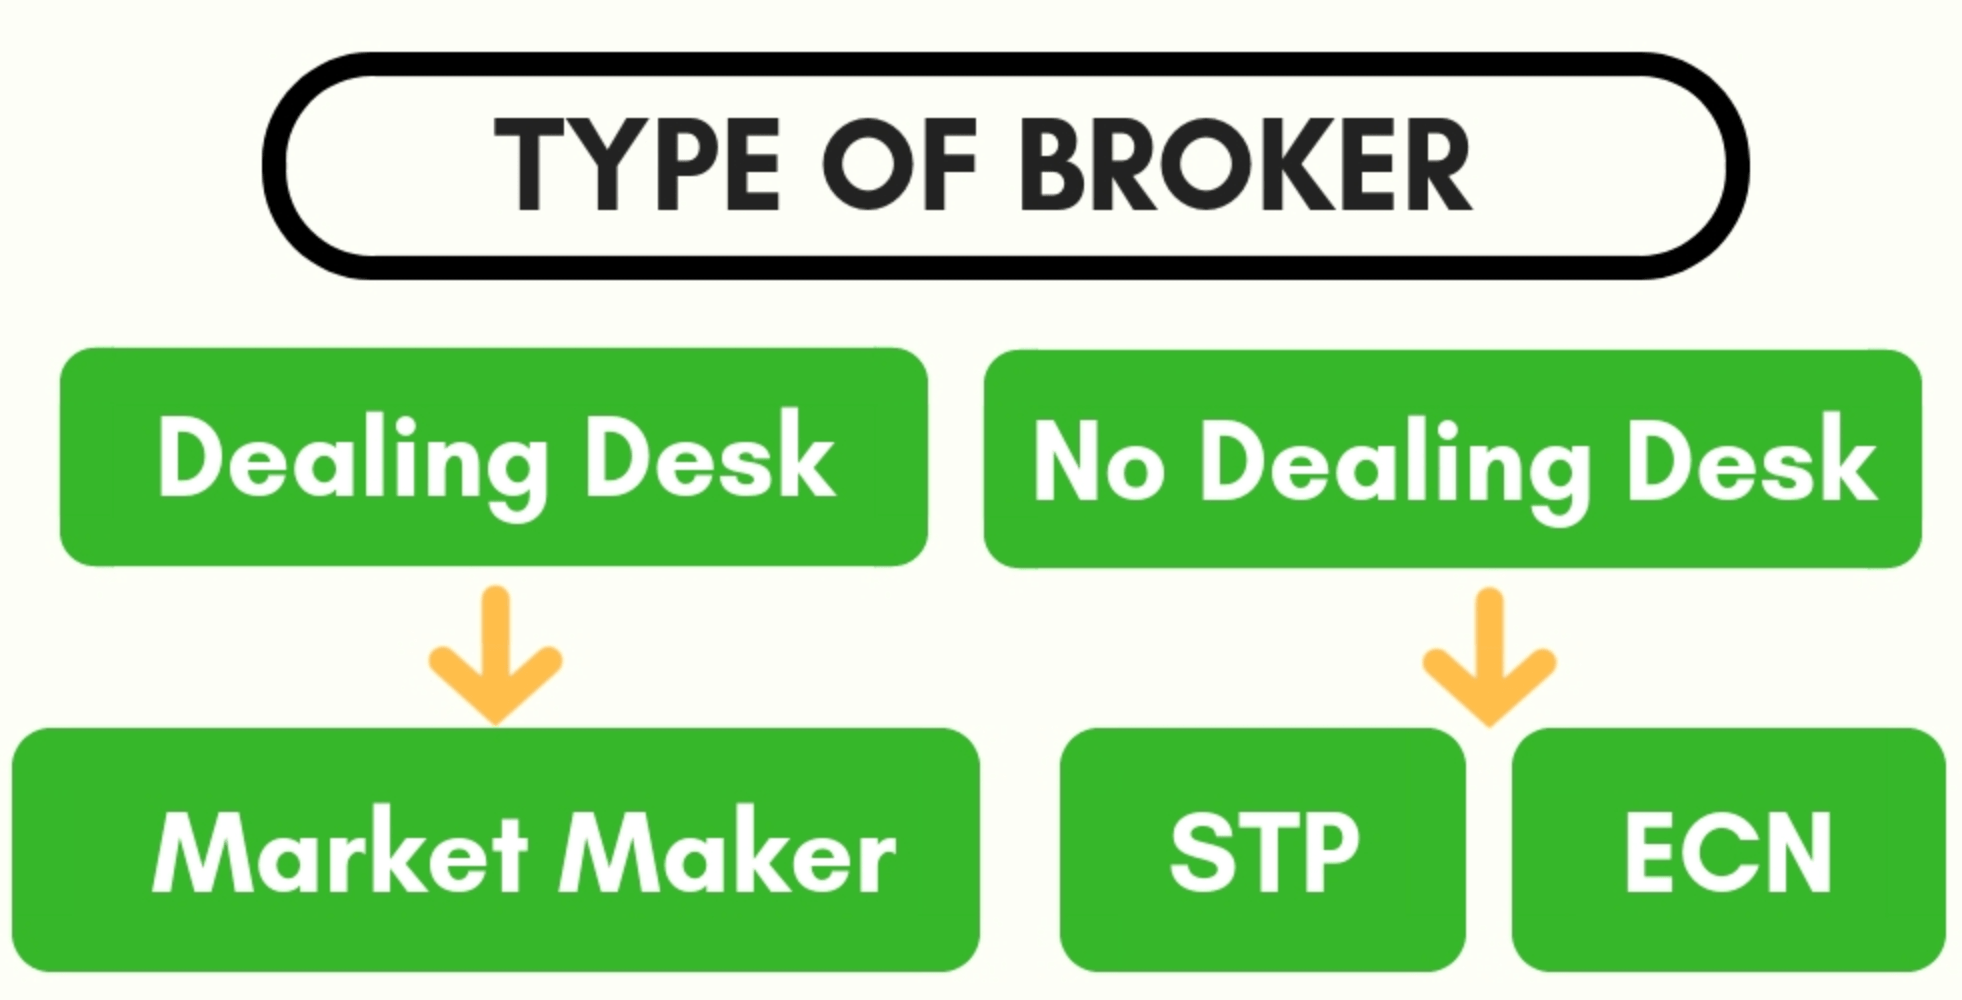 stp vs ecn brokers